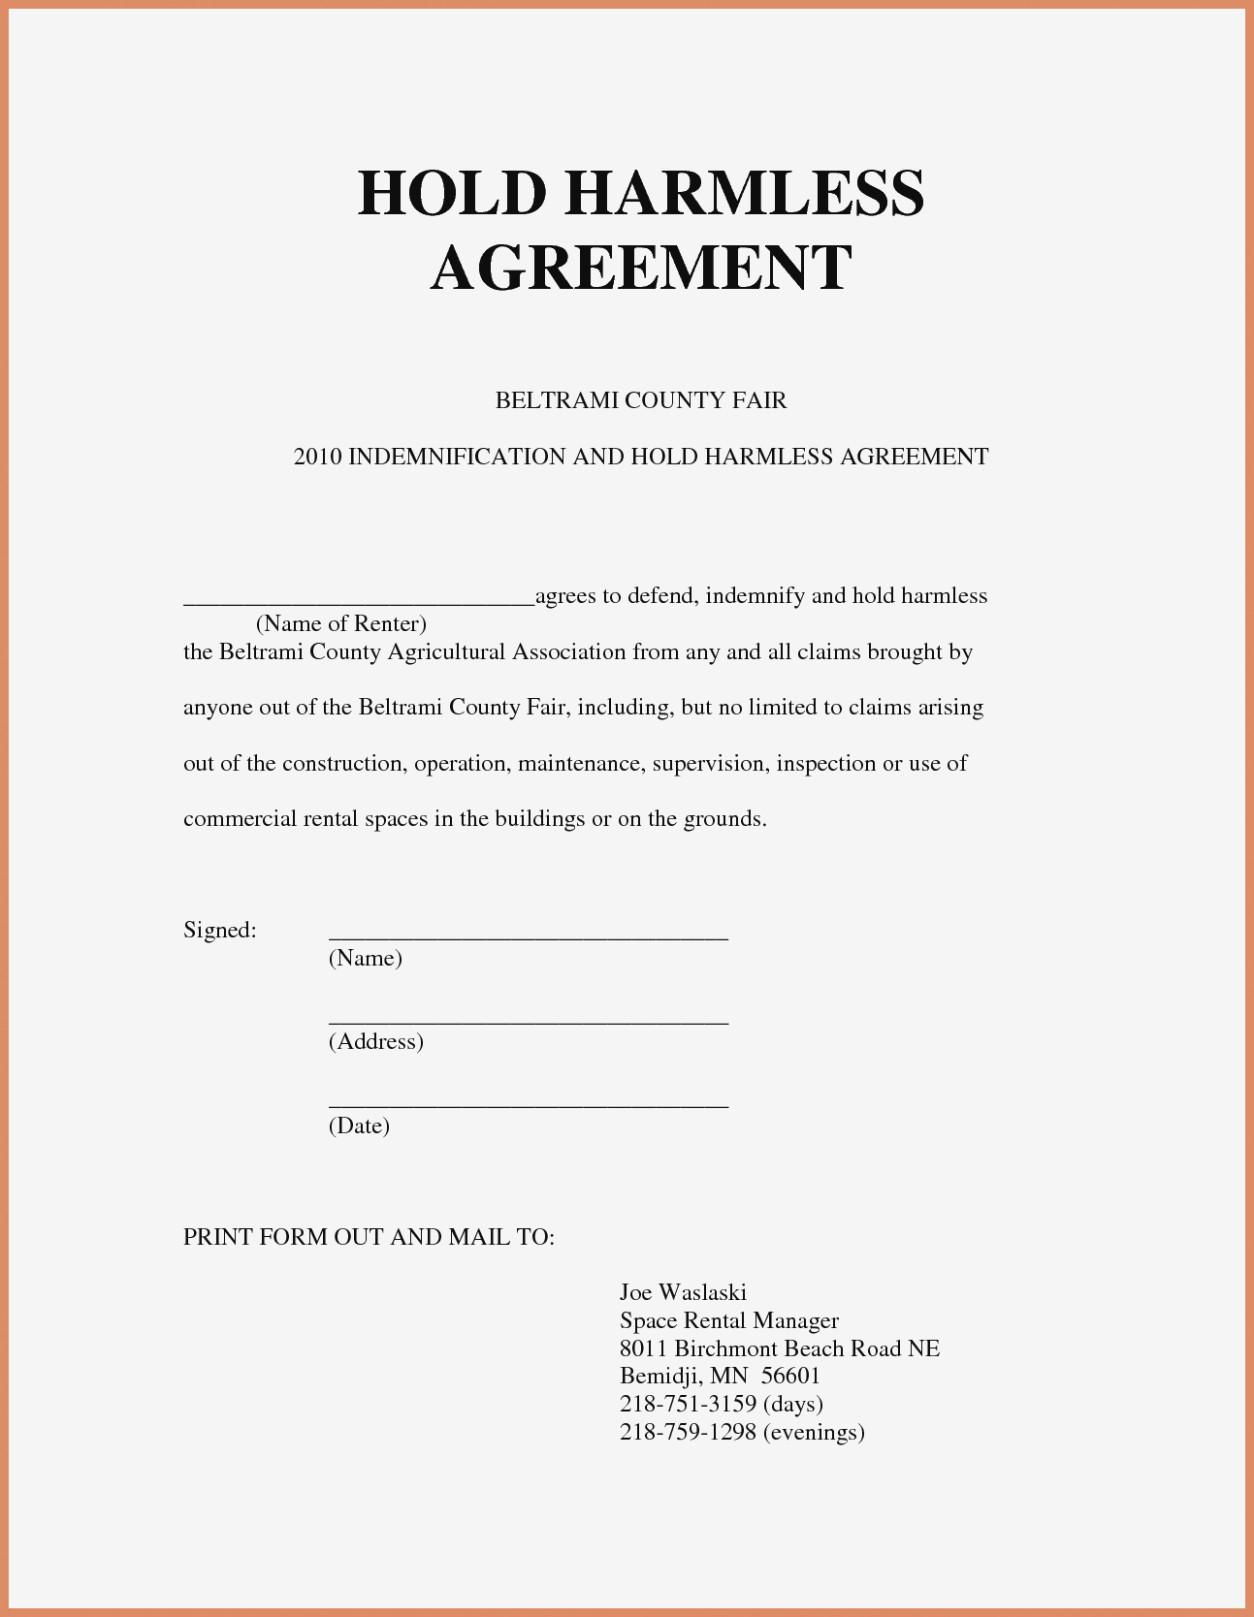 Sample Hold Harmless Agreement Form